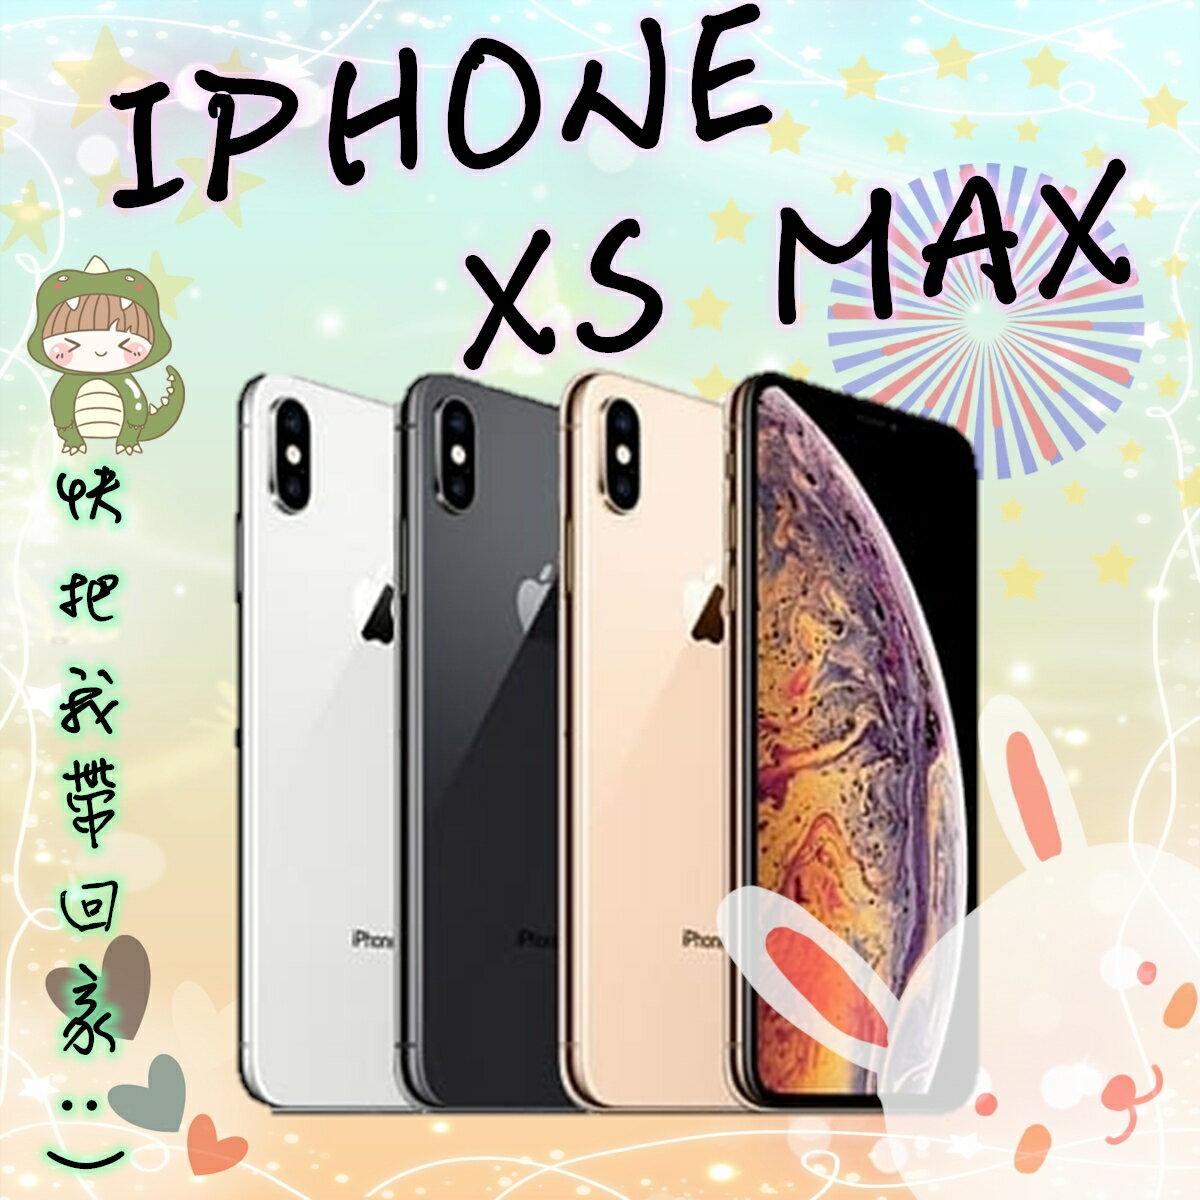 XS MAX IPhone 512G 6.5吋 全新未拆封 Apple 台灣公司貨 原廠保固一年【雄華國際】